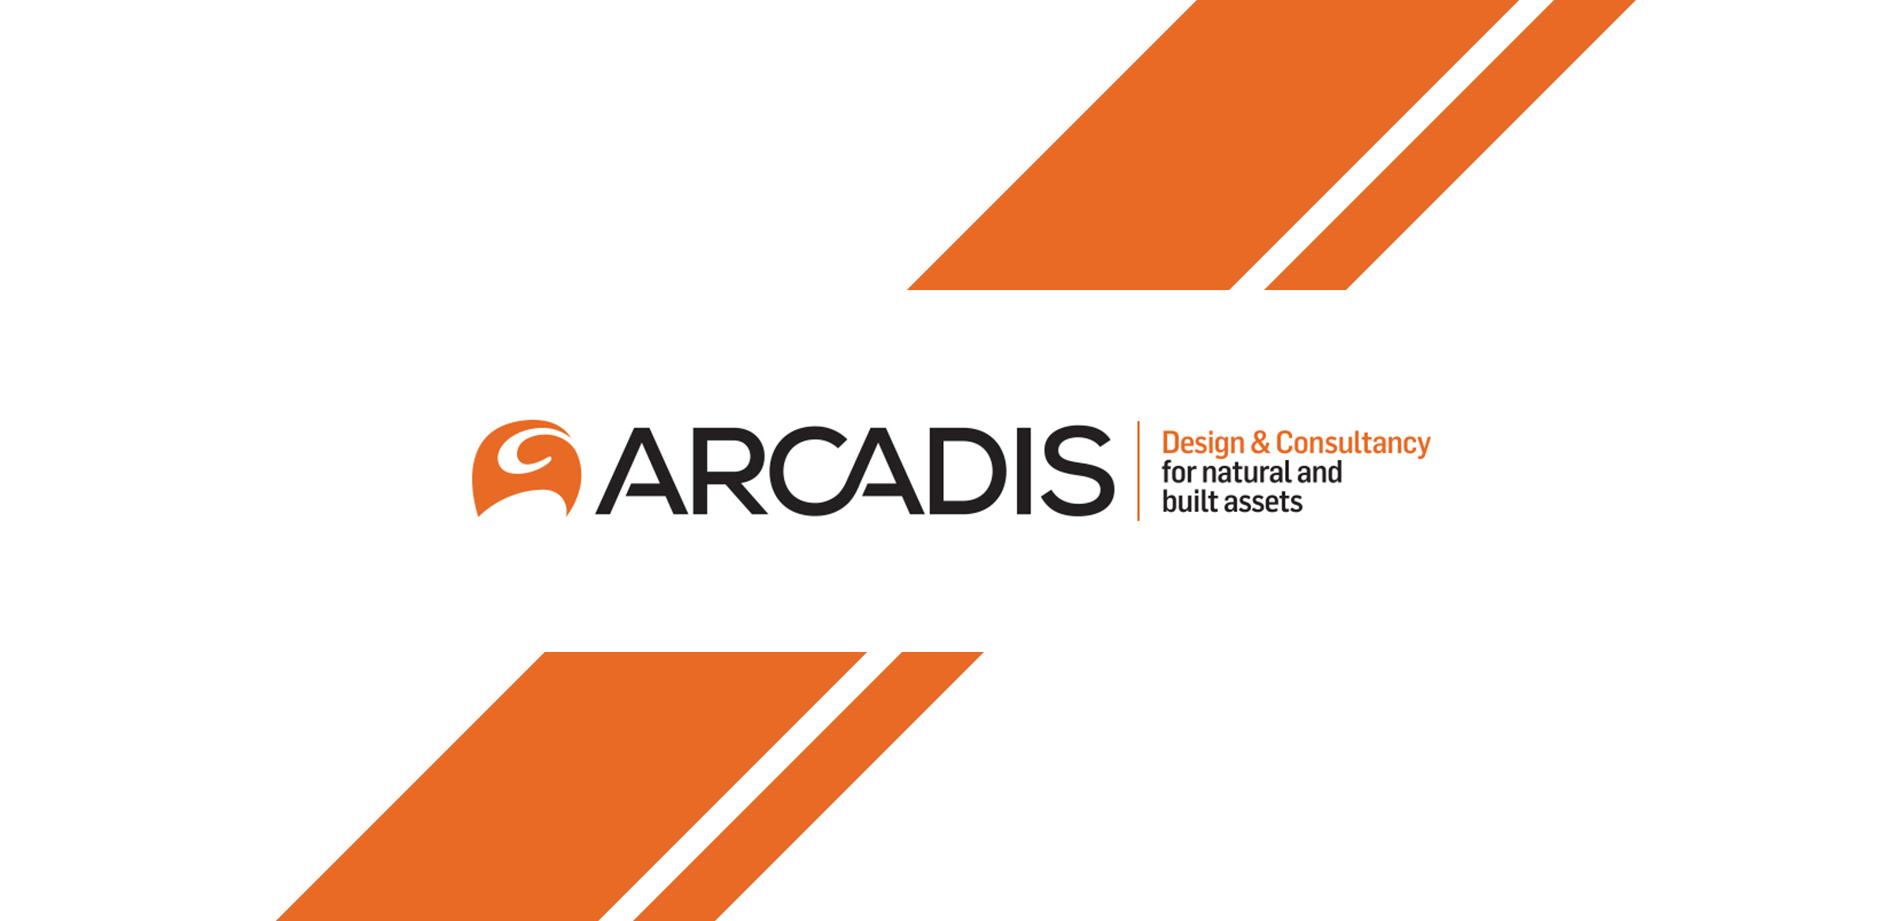 arcadis_work